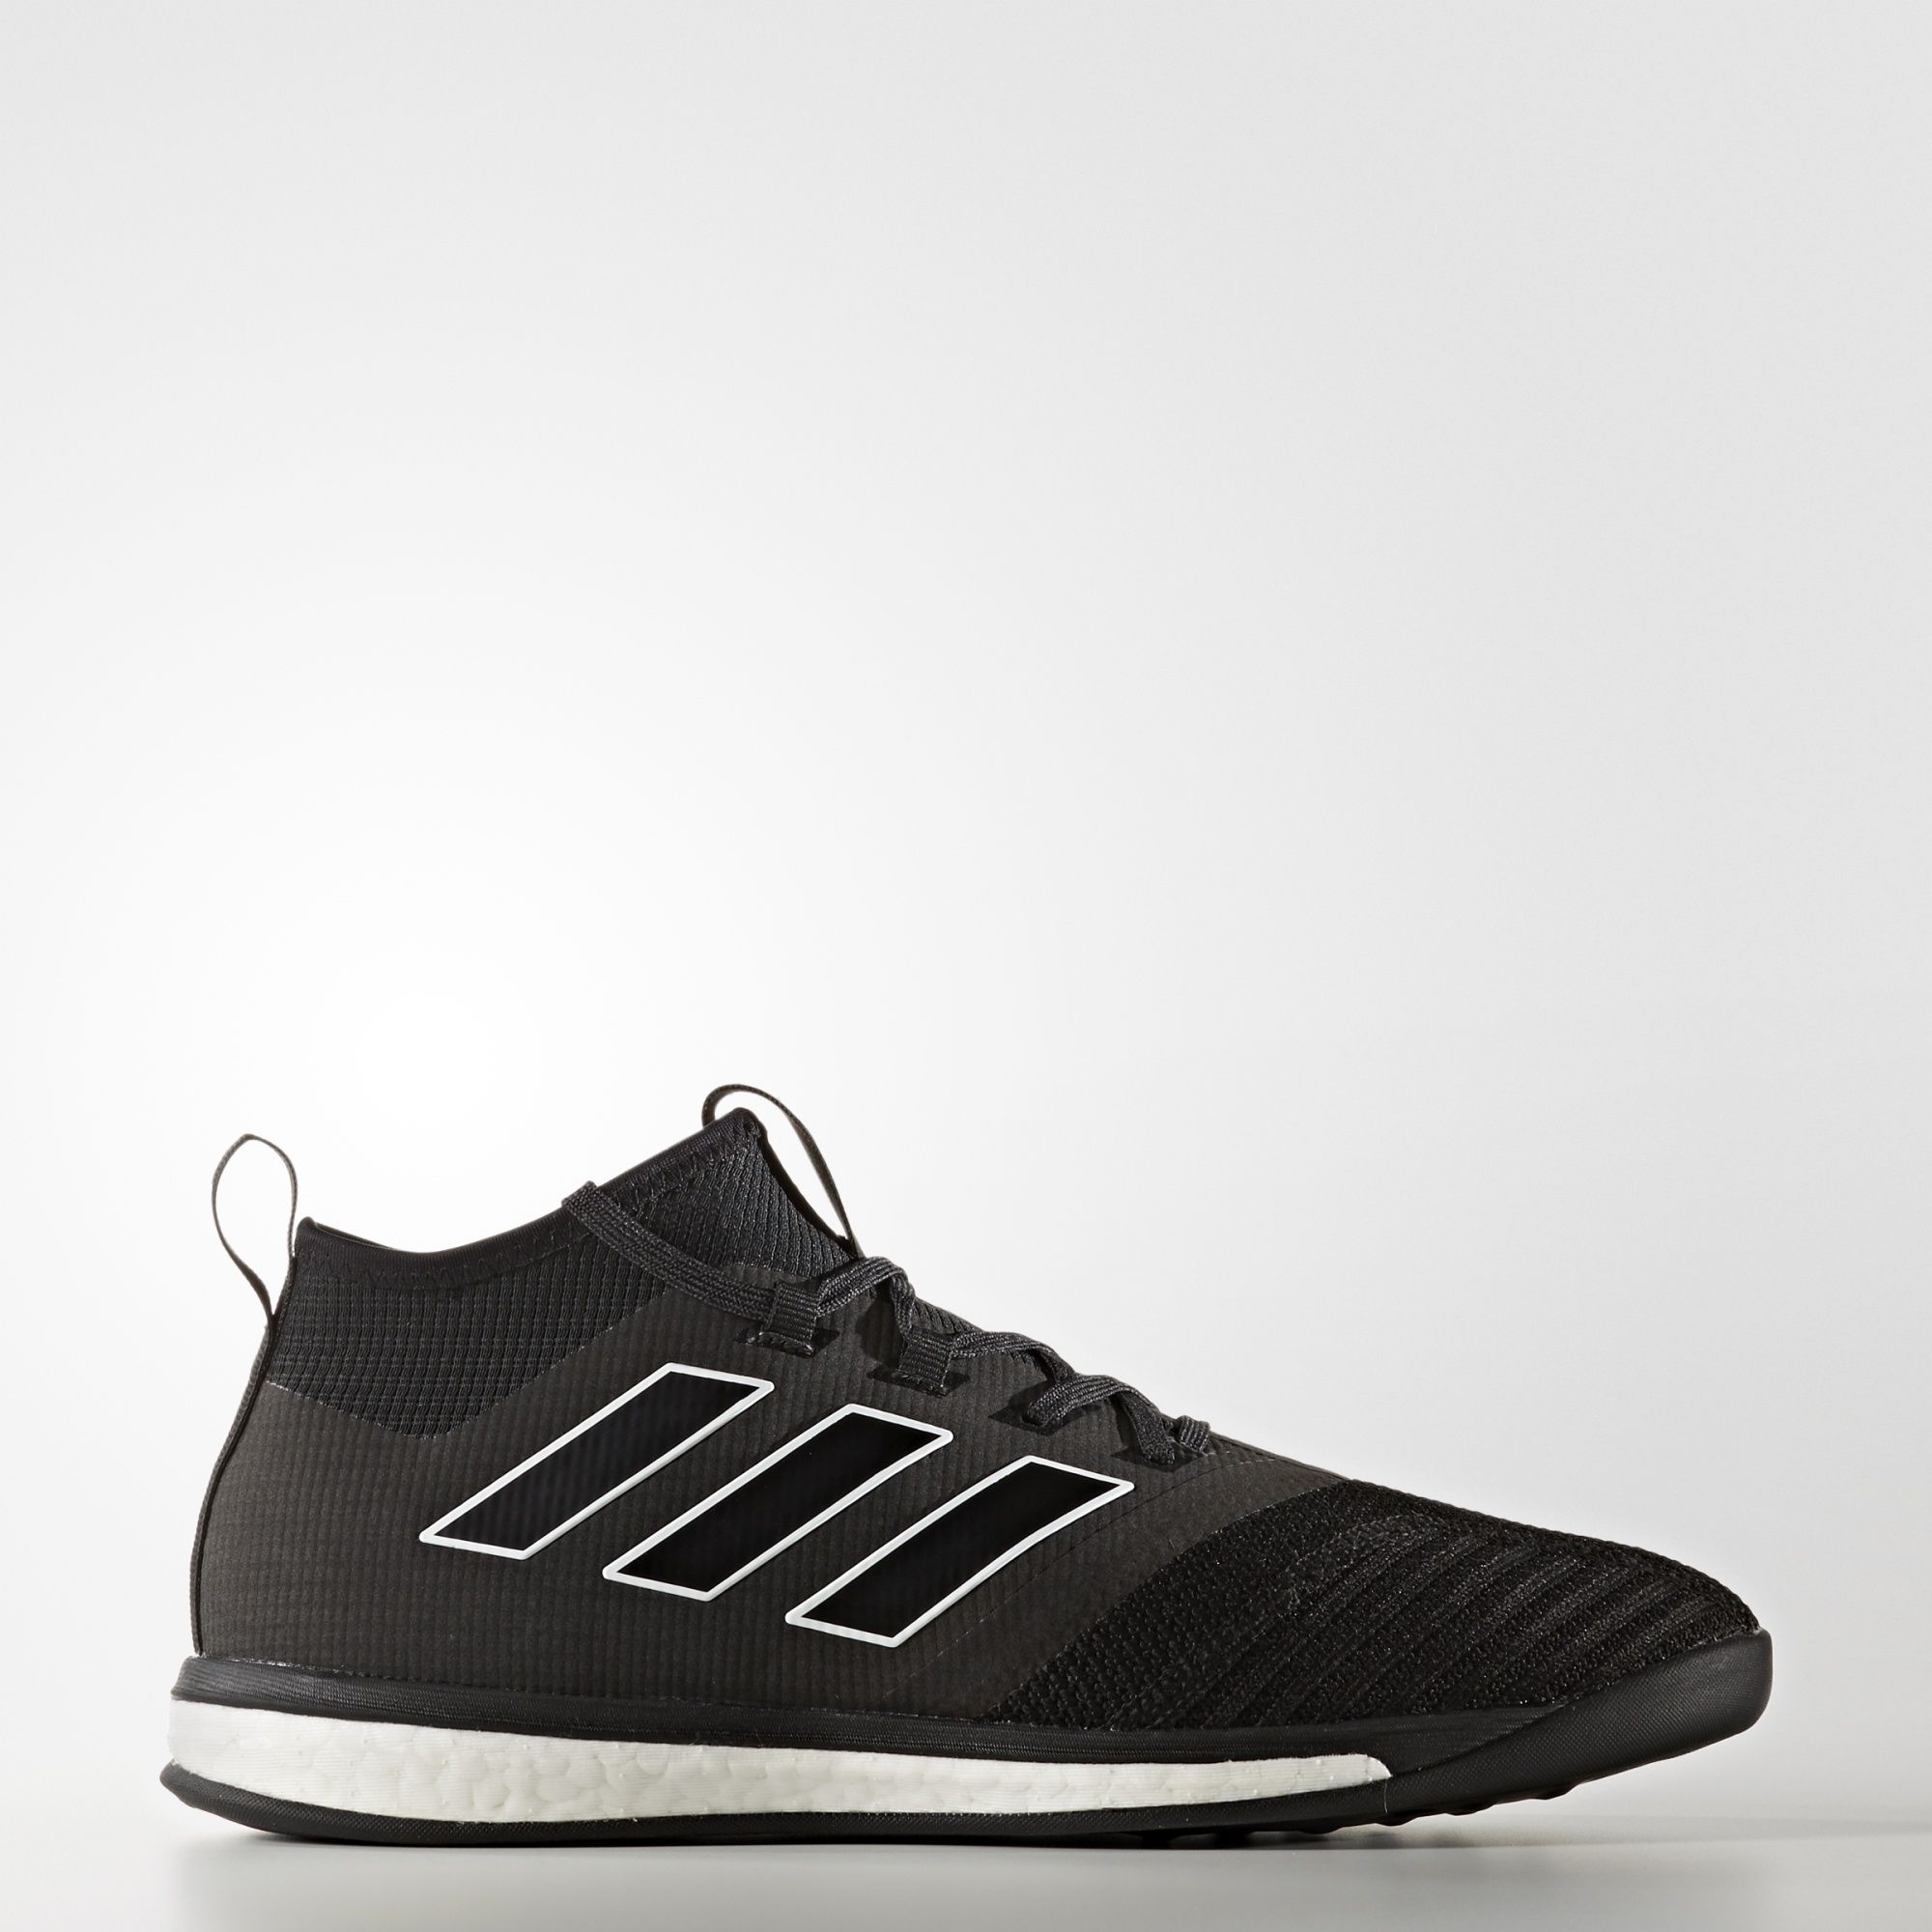 Adidas ACE TANGO 17.1 SHOES - Soccer Premier a10a381f9